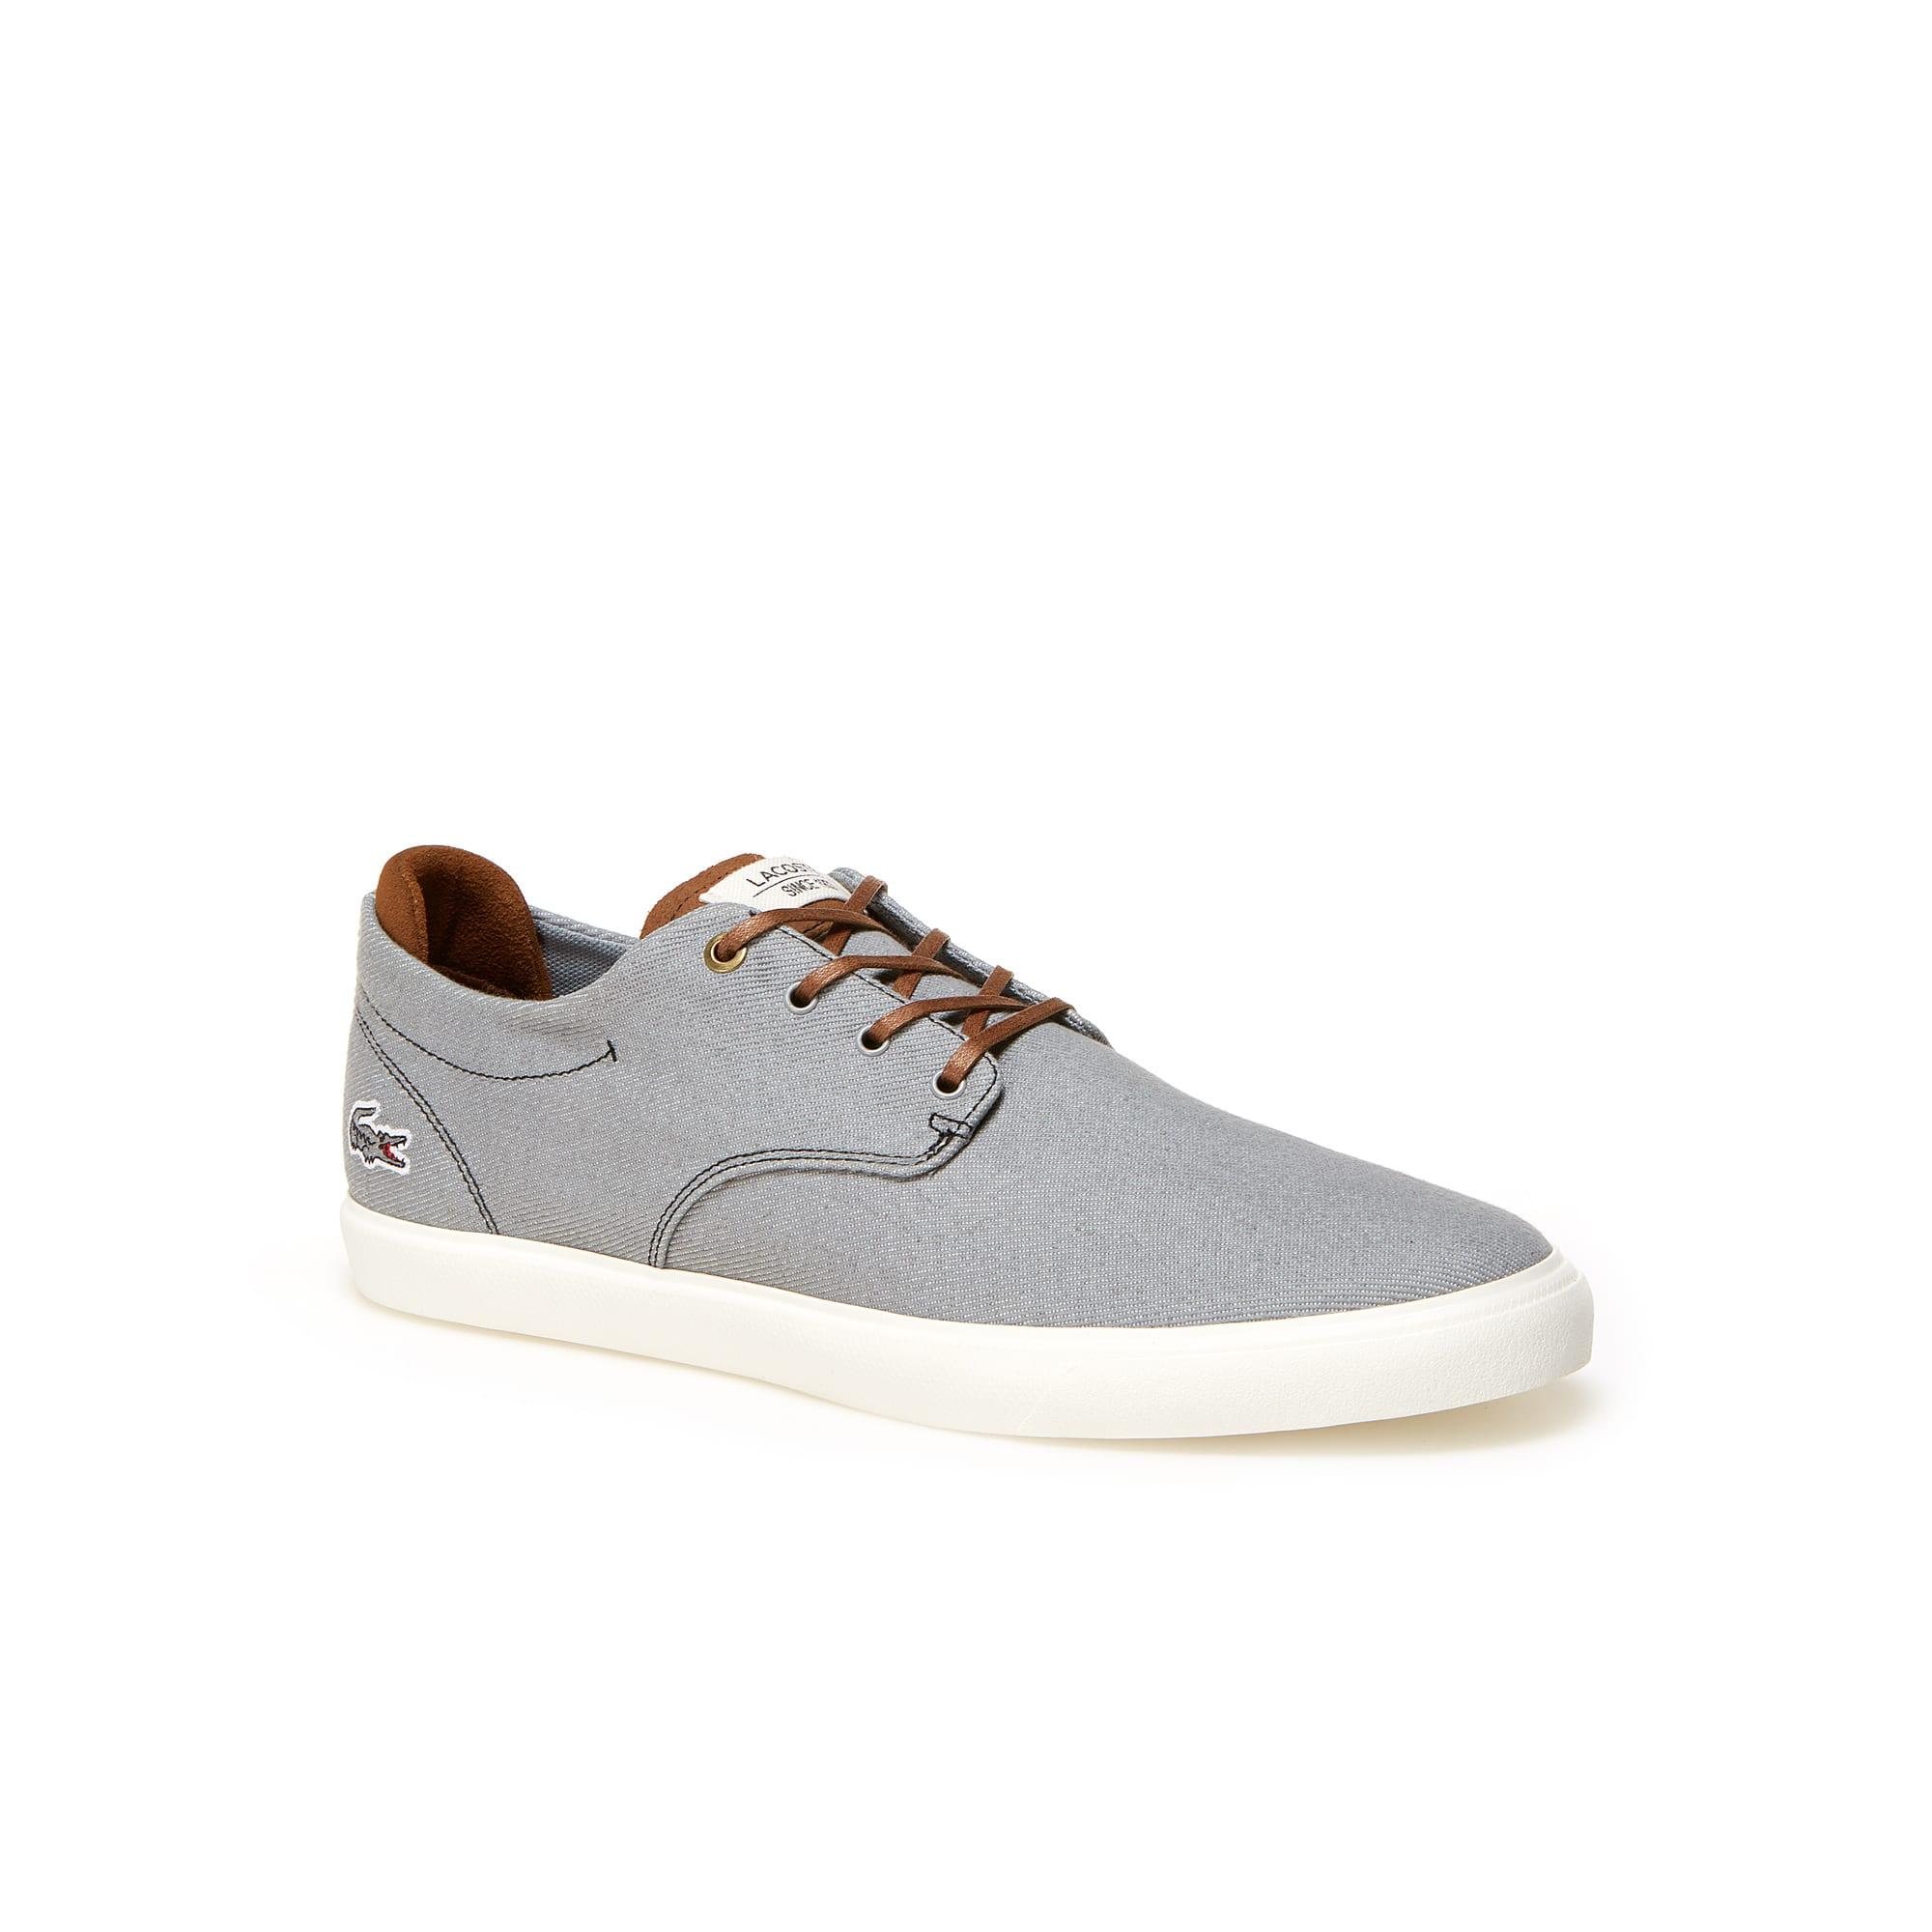 Herren-Sneakers ESPERE aus Canvas